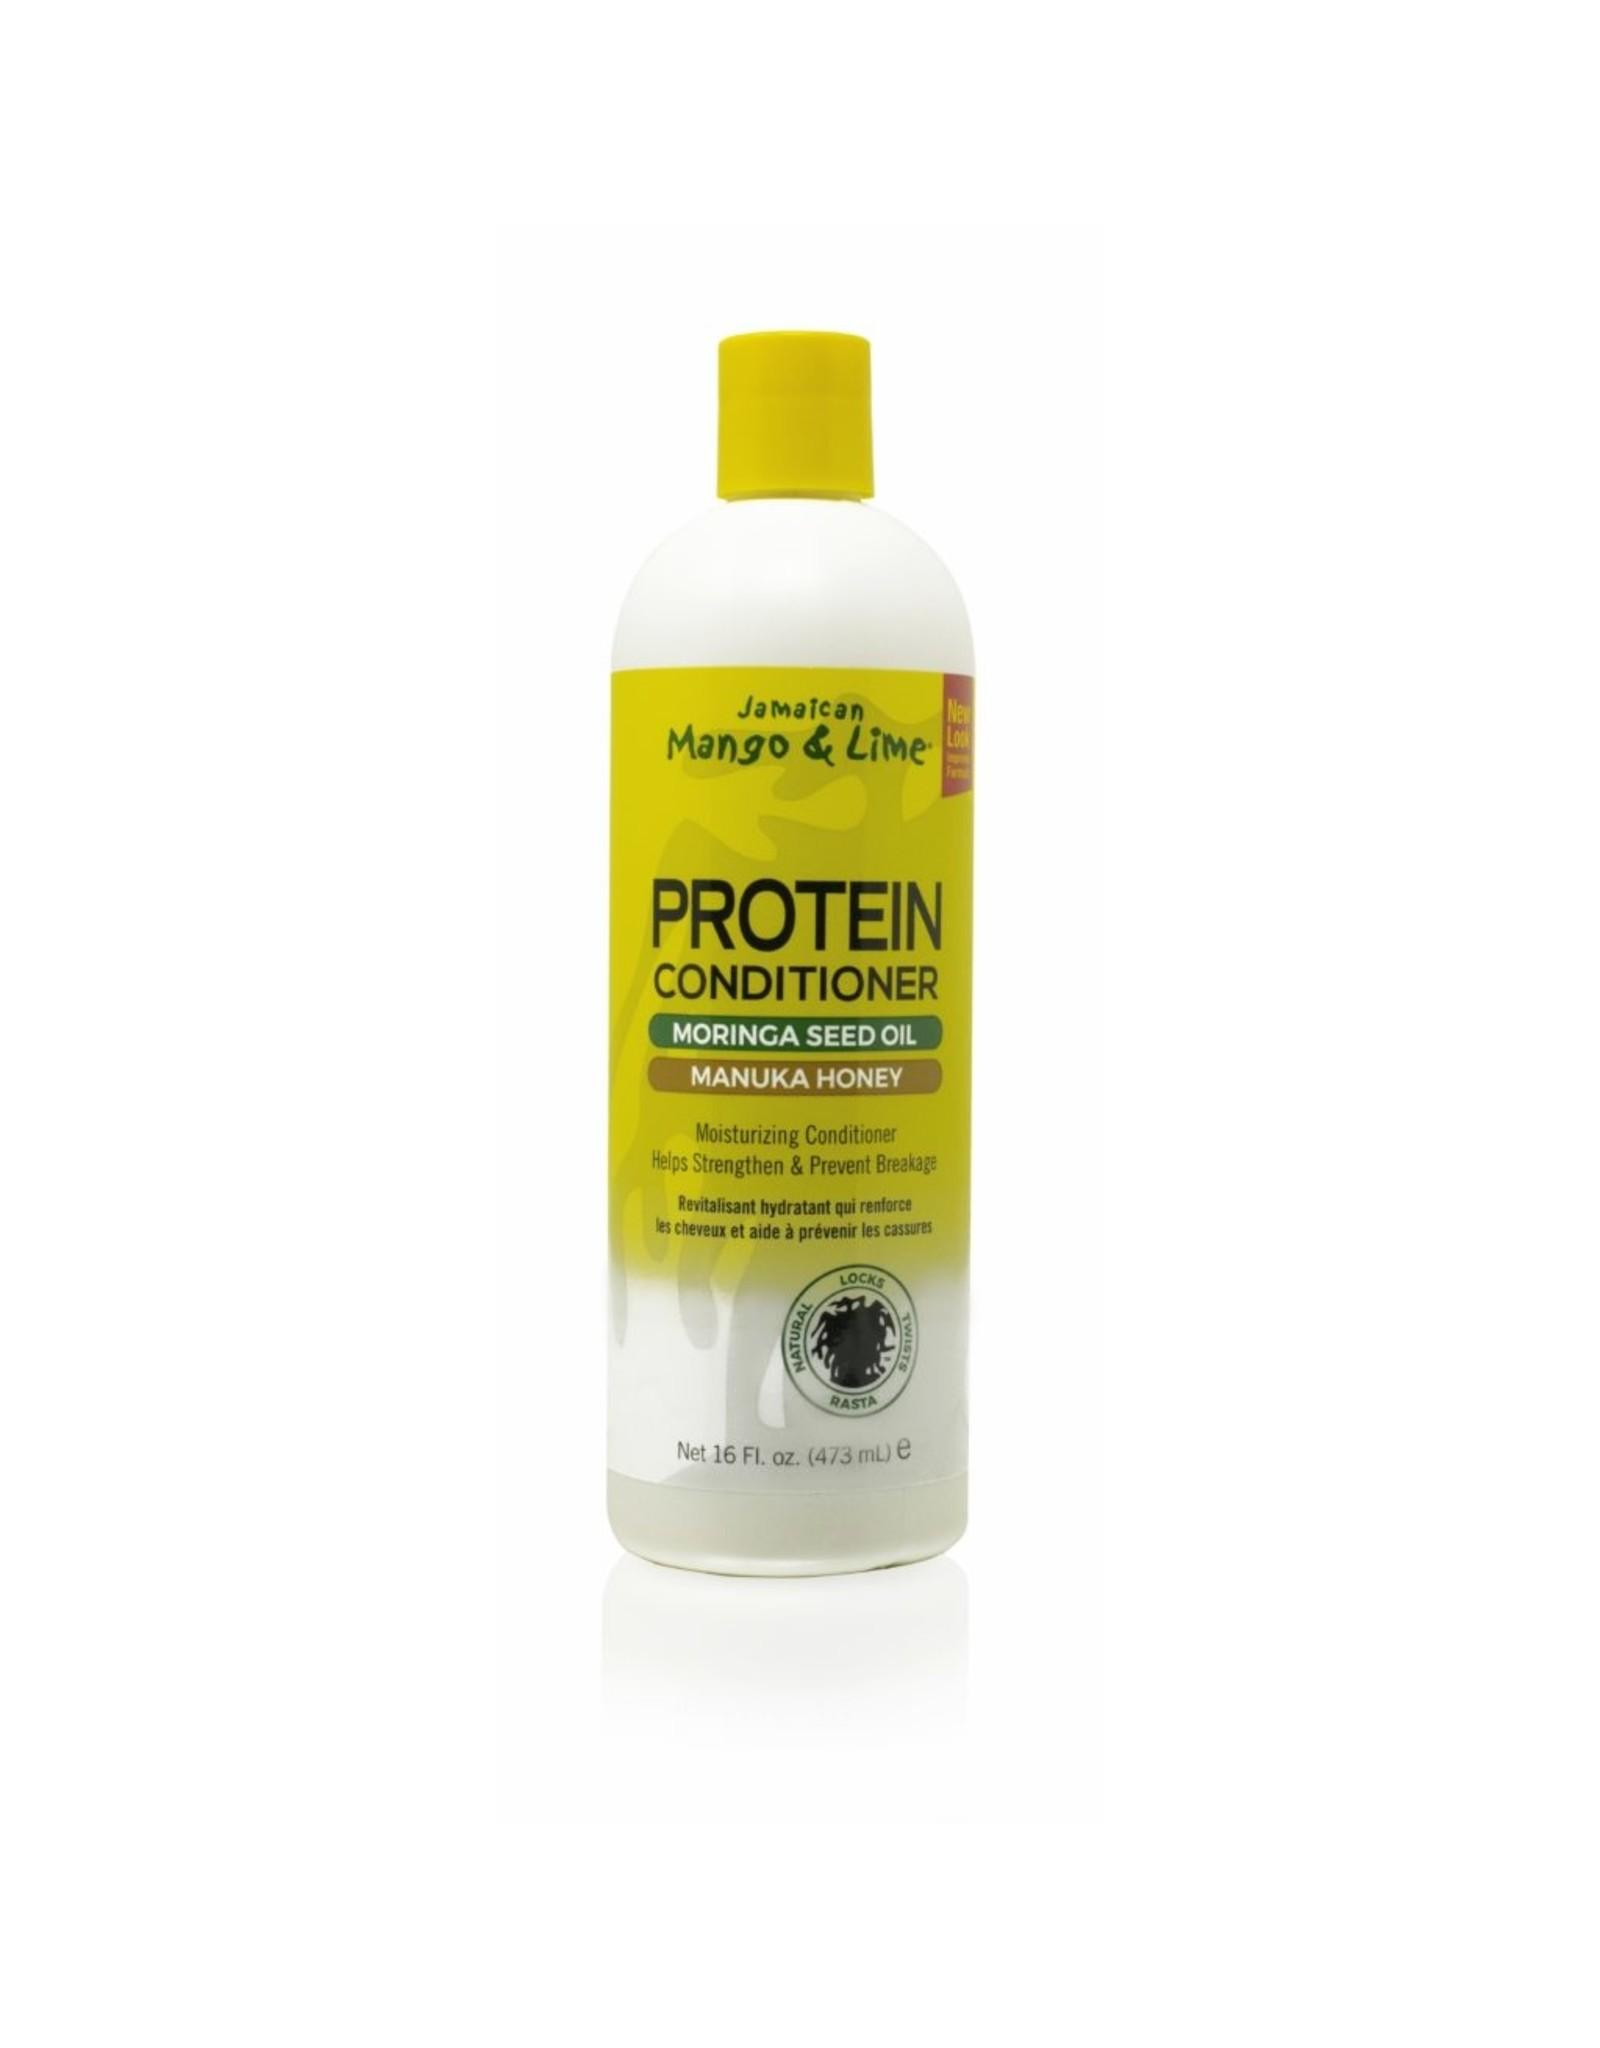 Jamaican Mango & Lime Protein Conditoner